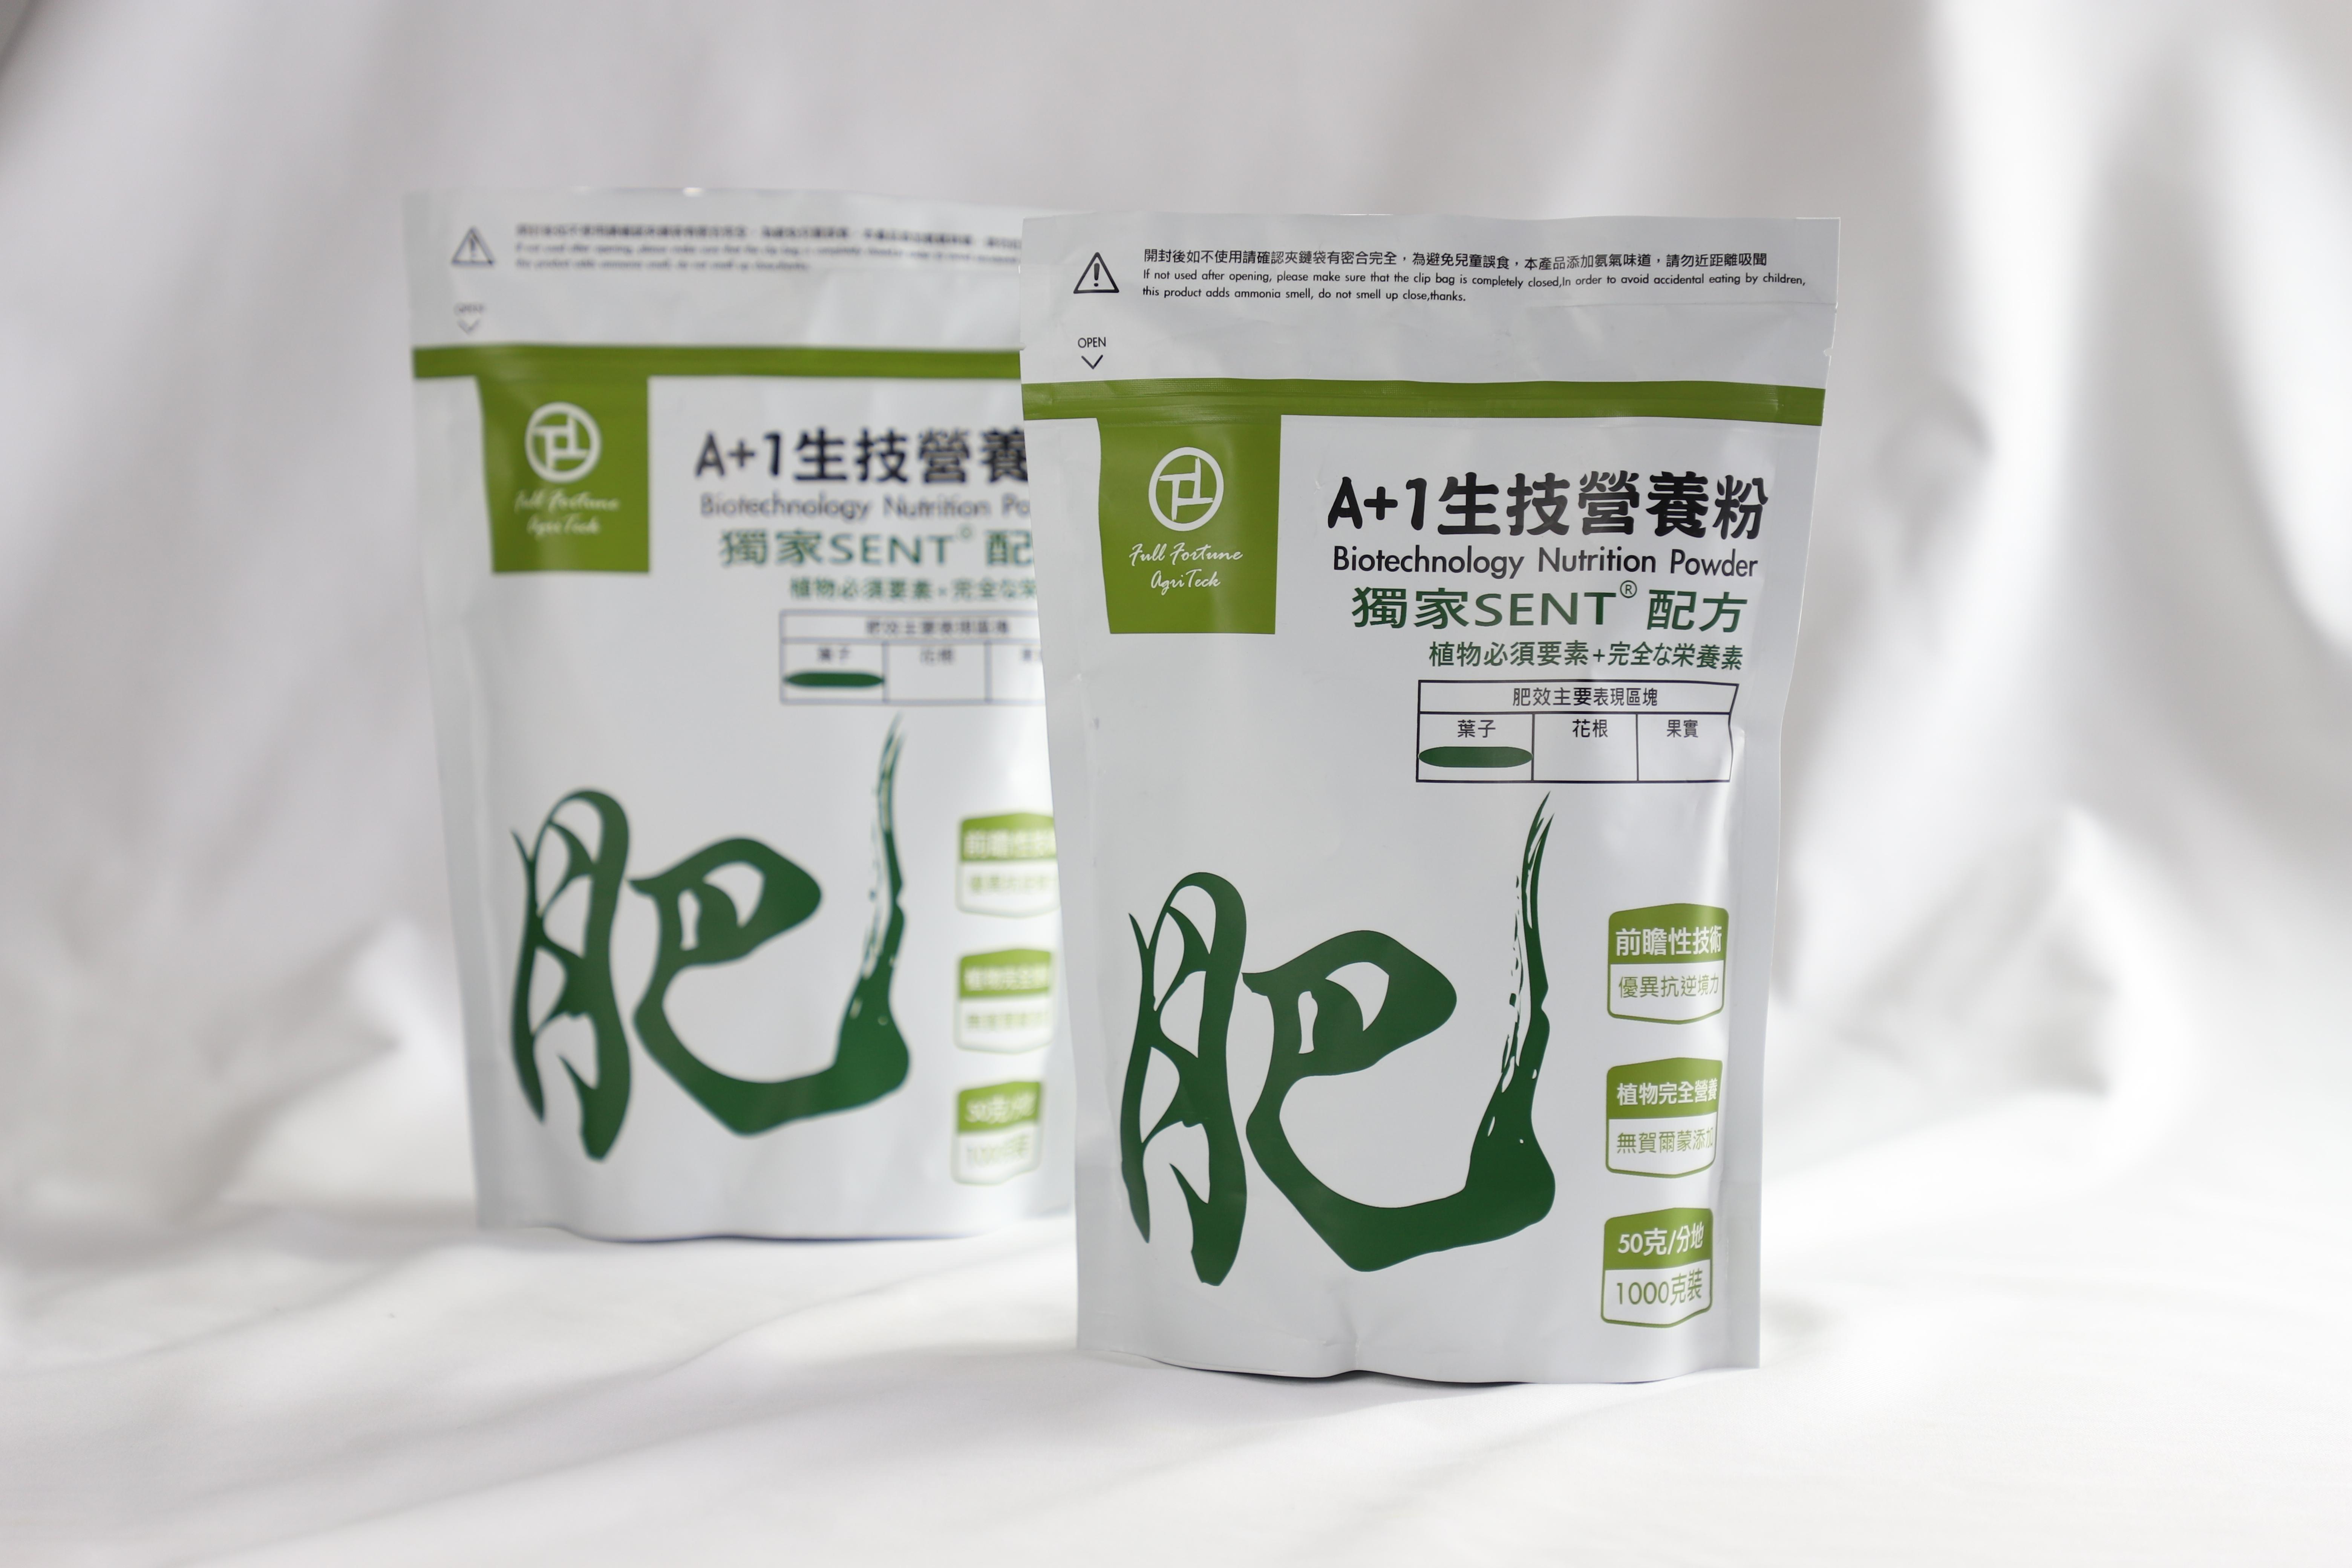 SENT配方A+1生技營養粉 產品介紹及詳細使用說明